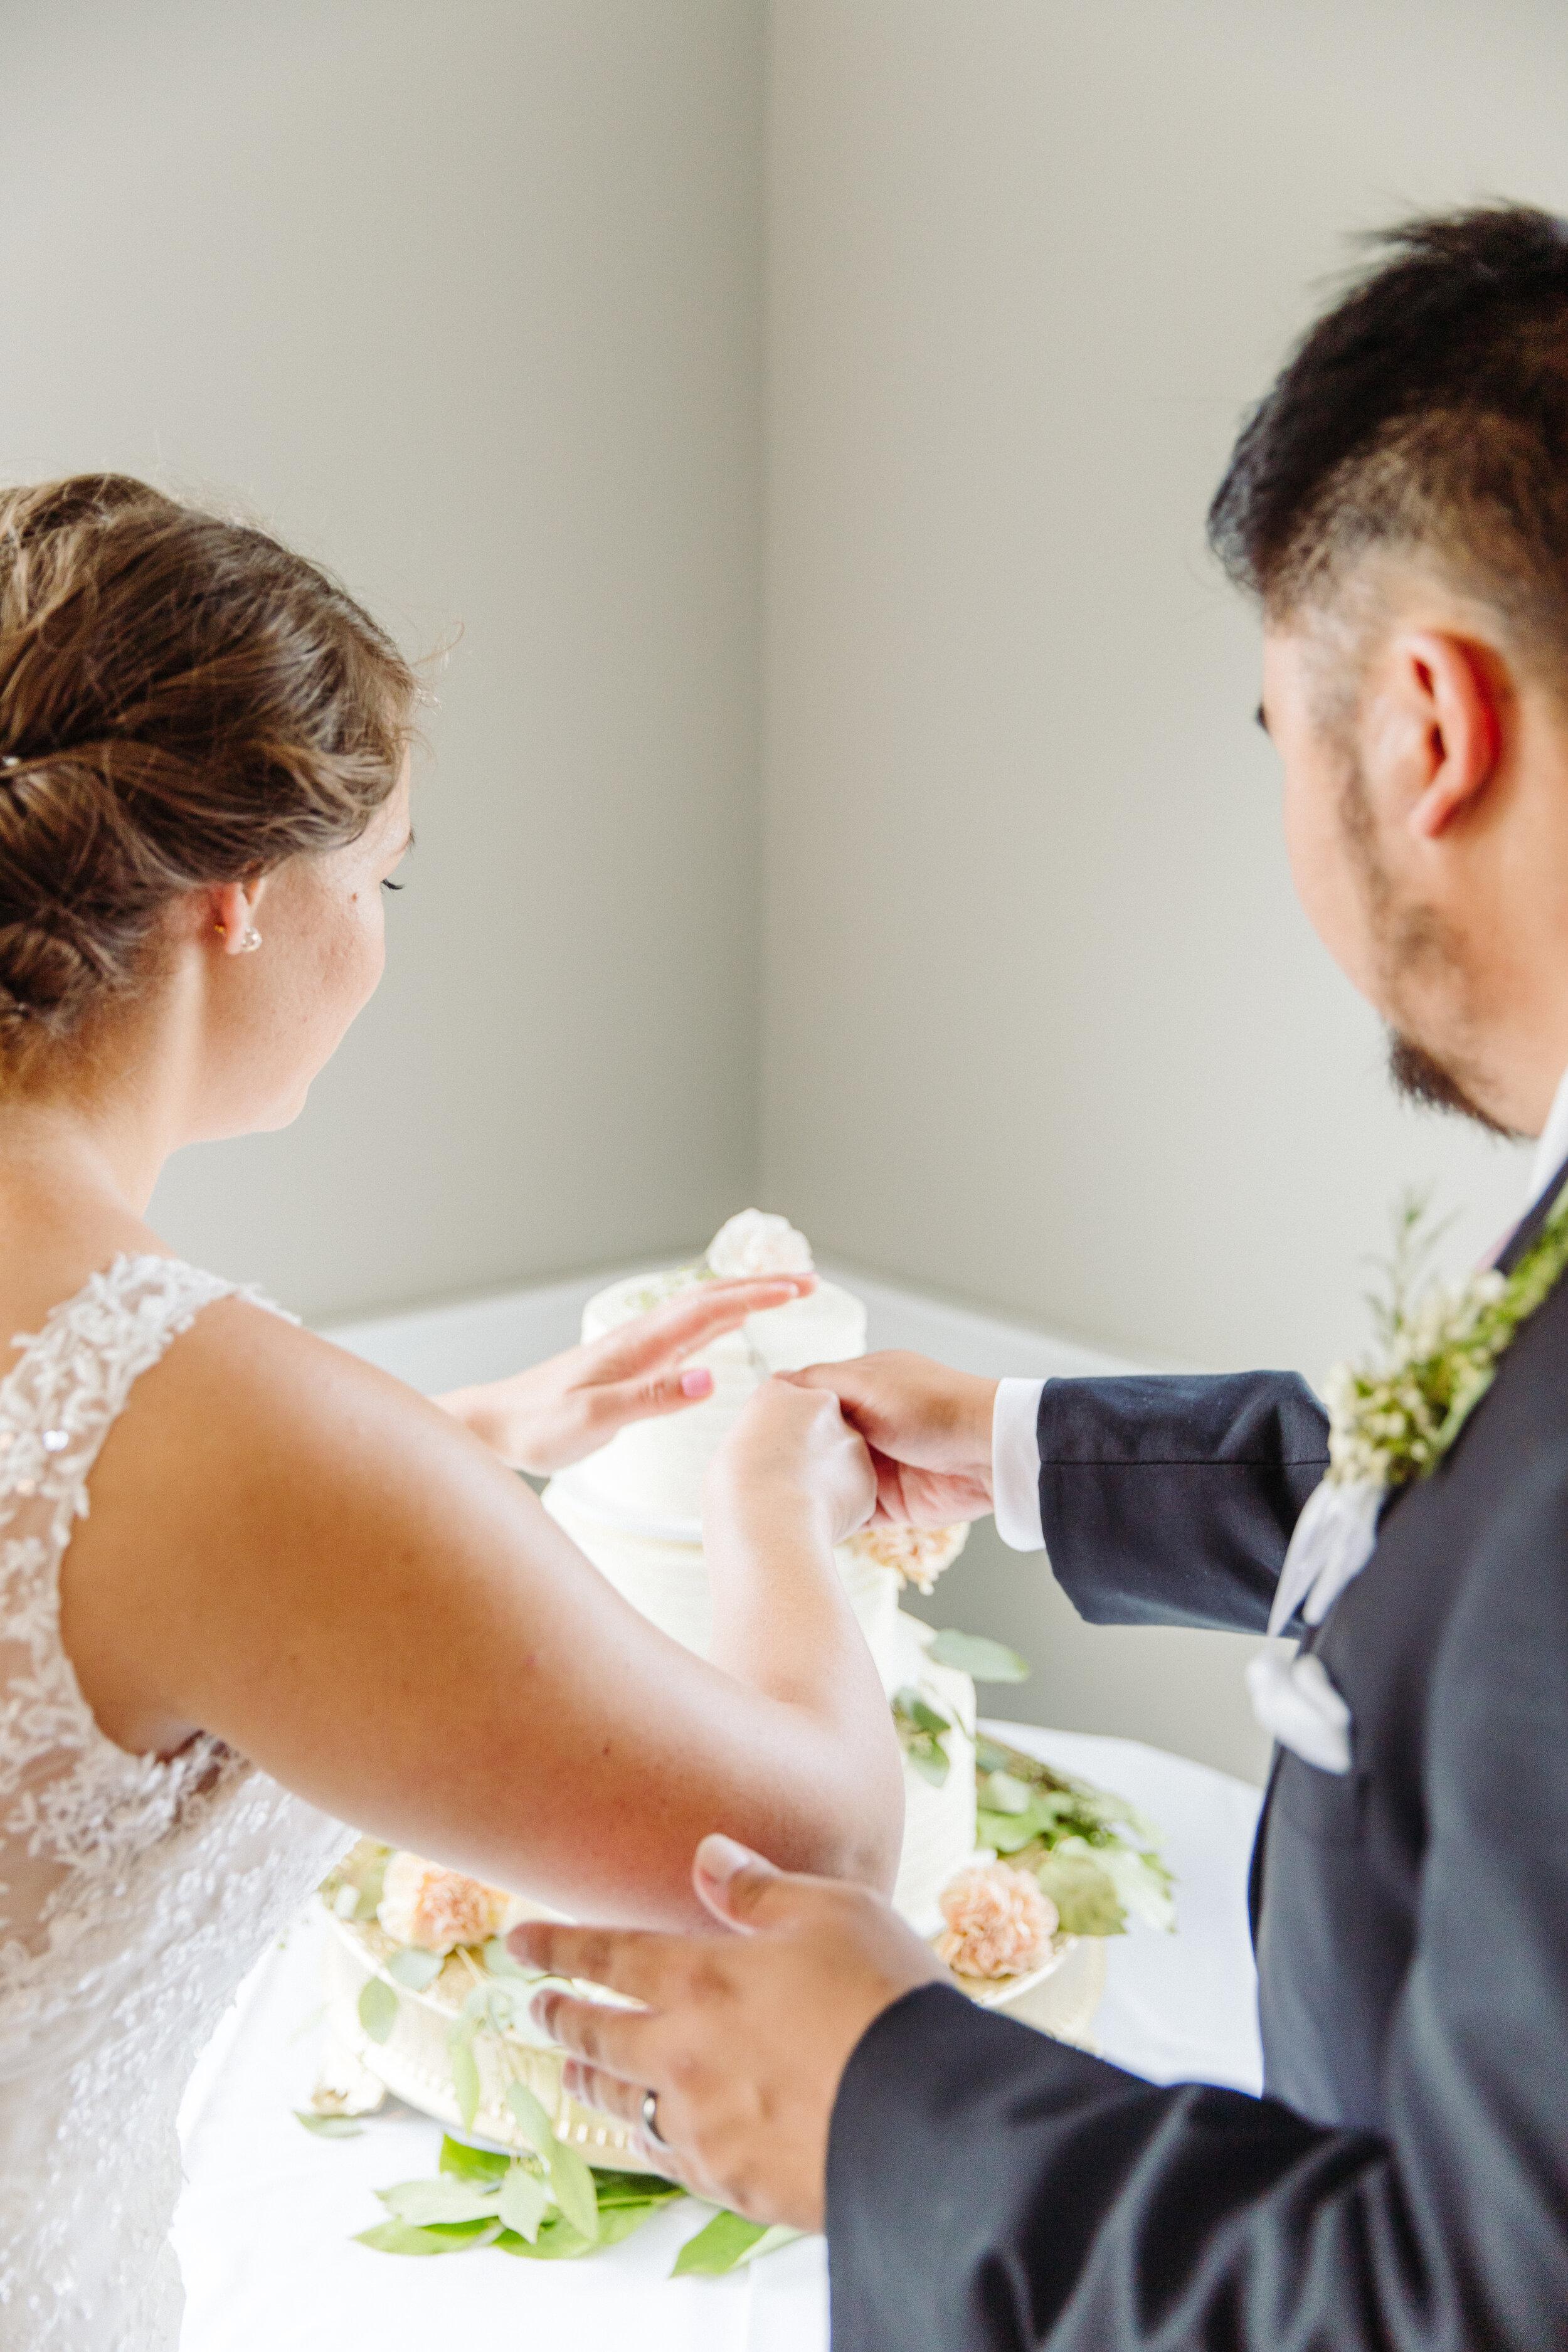 S&B Wedding- Reception & Dance-33.jpg